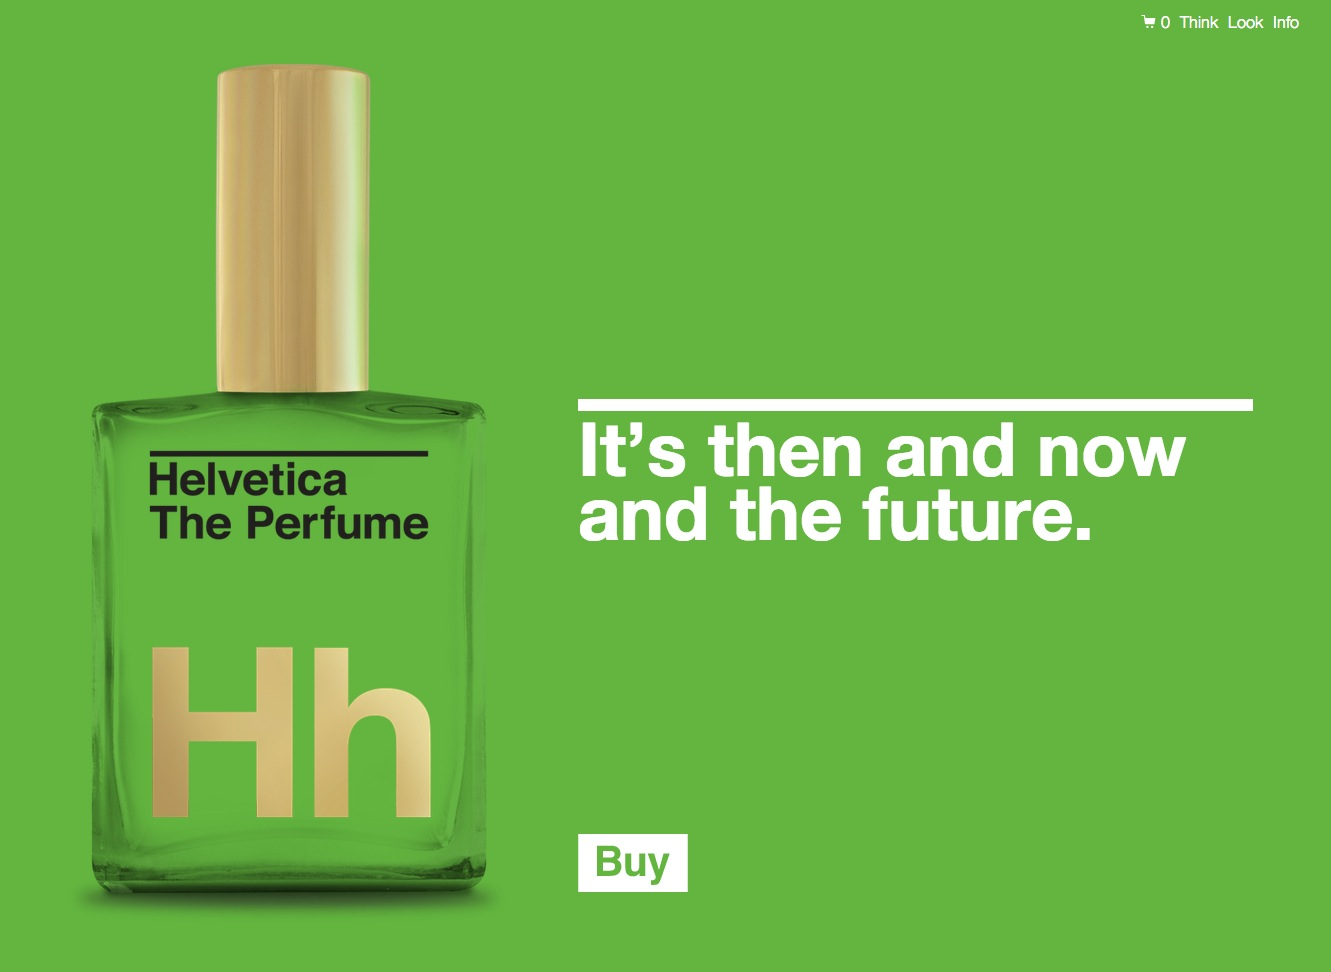 Helvetica-The-Perfume-4